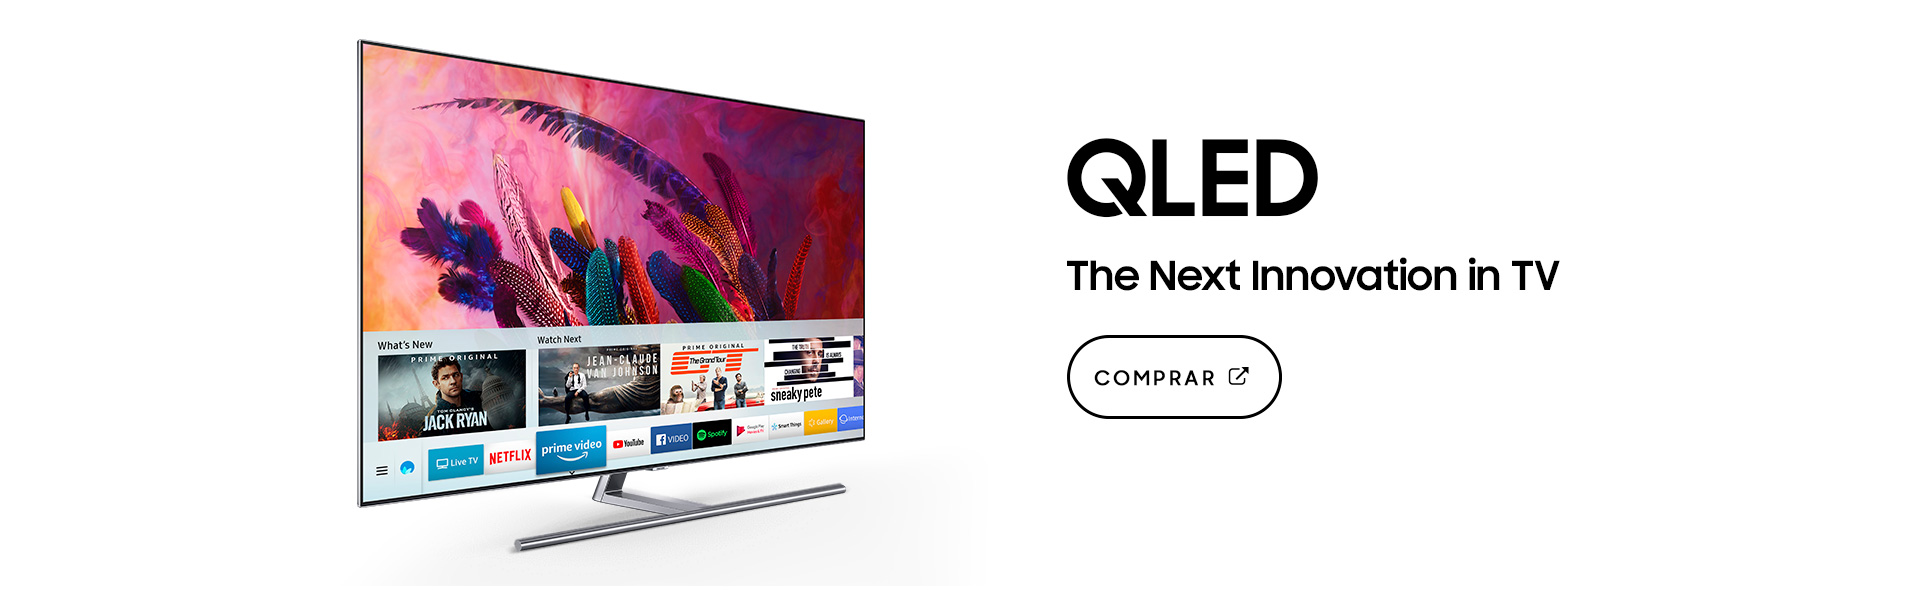 Televisores QLED